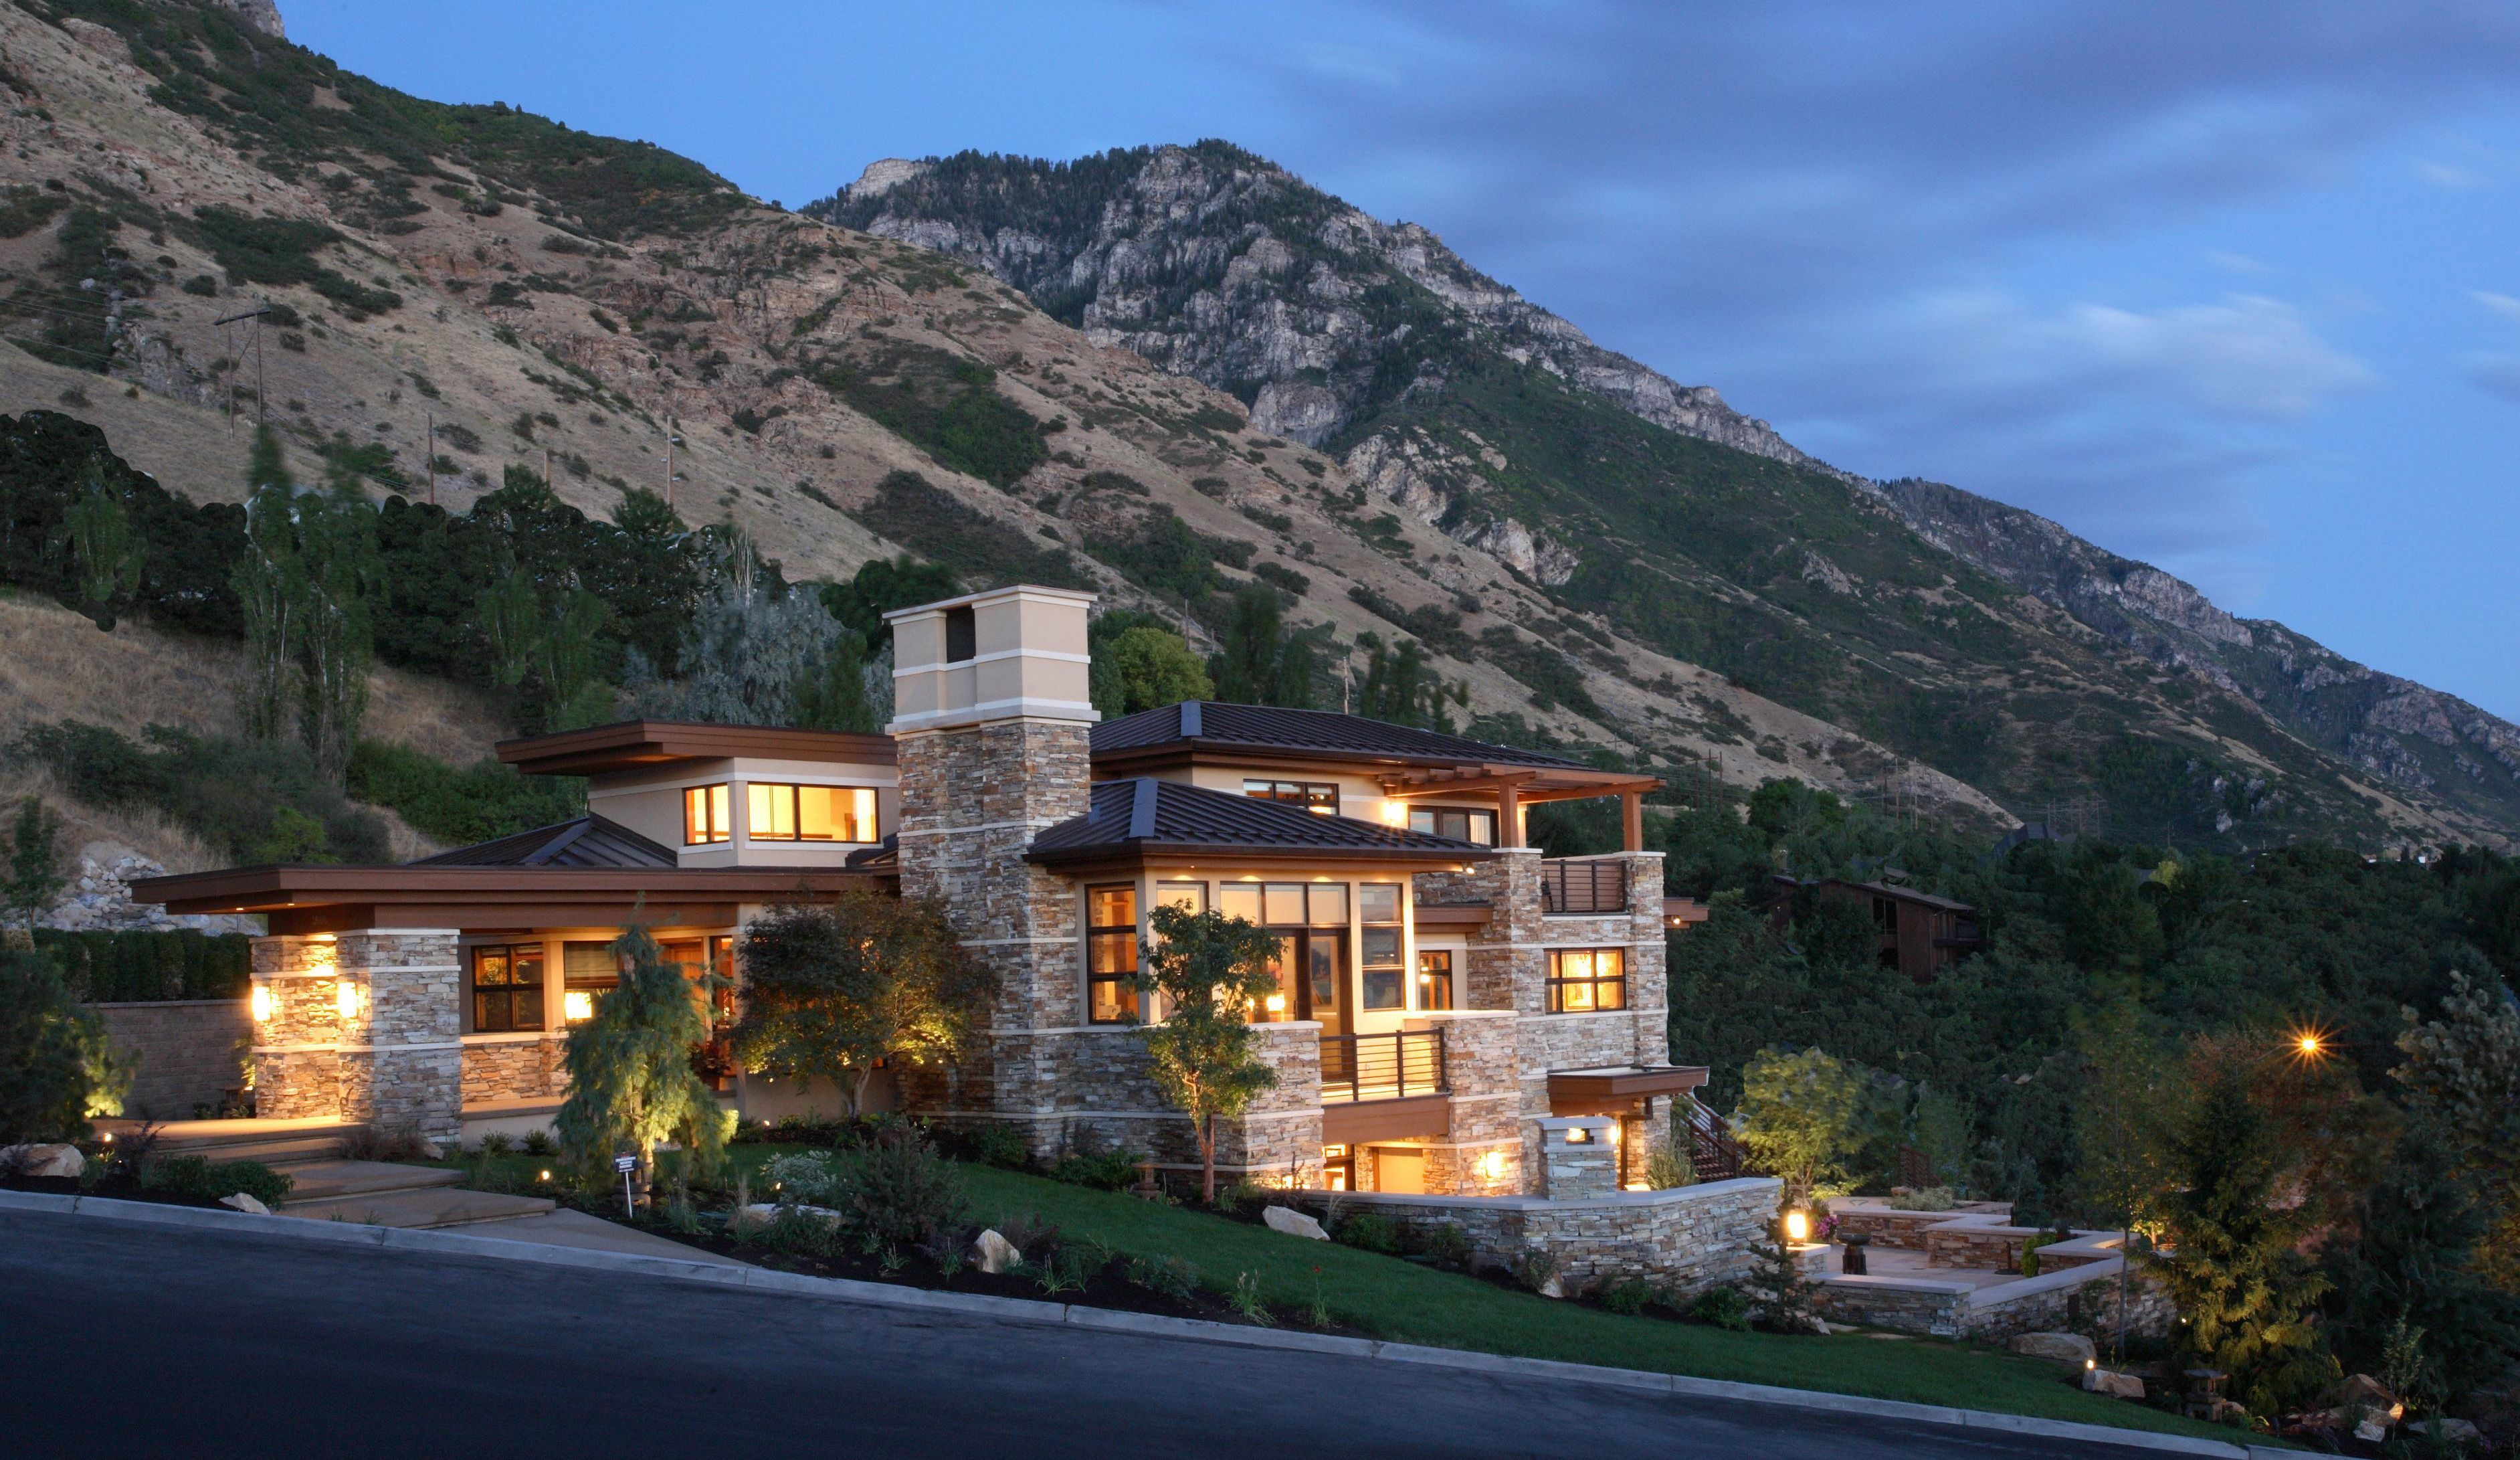 House design northland - Prairie Style Design Jeremy Fillmore Northland Design Group